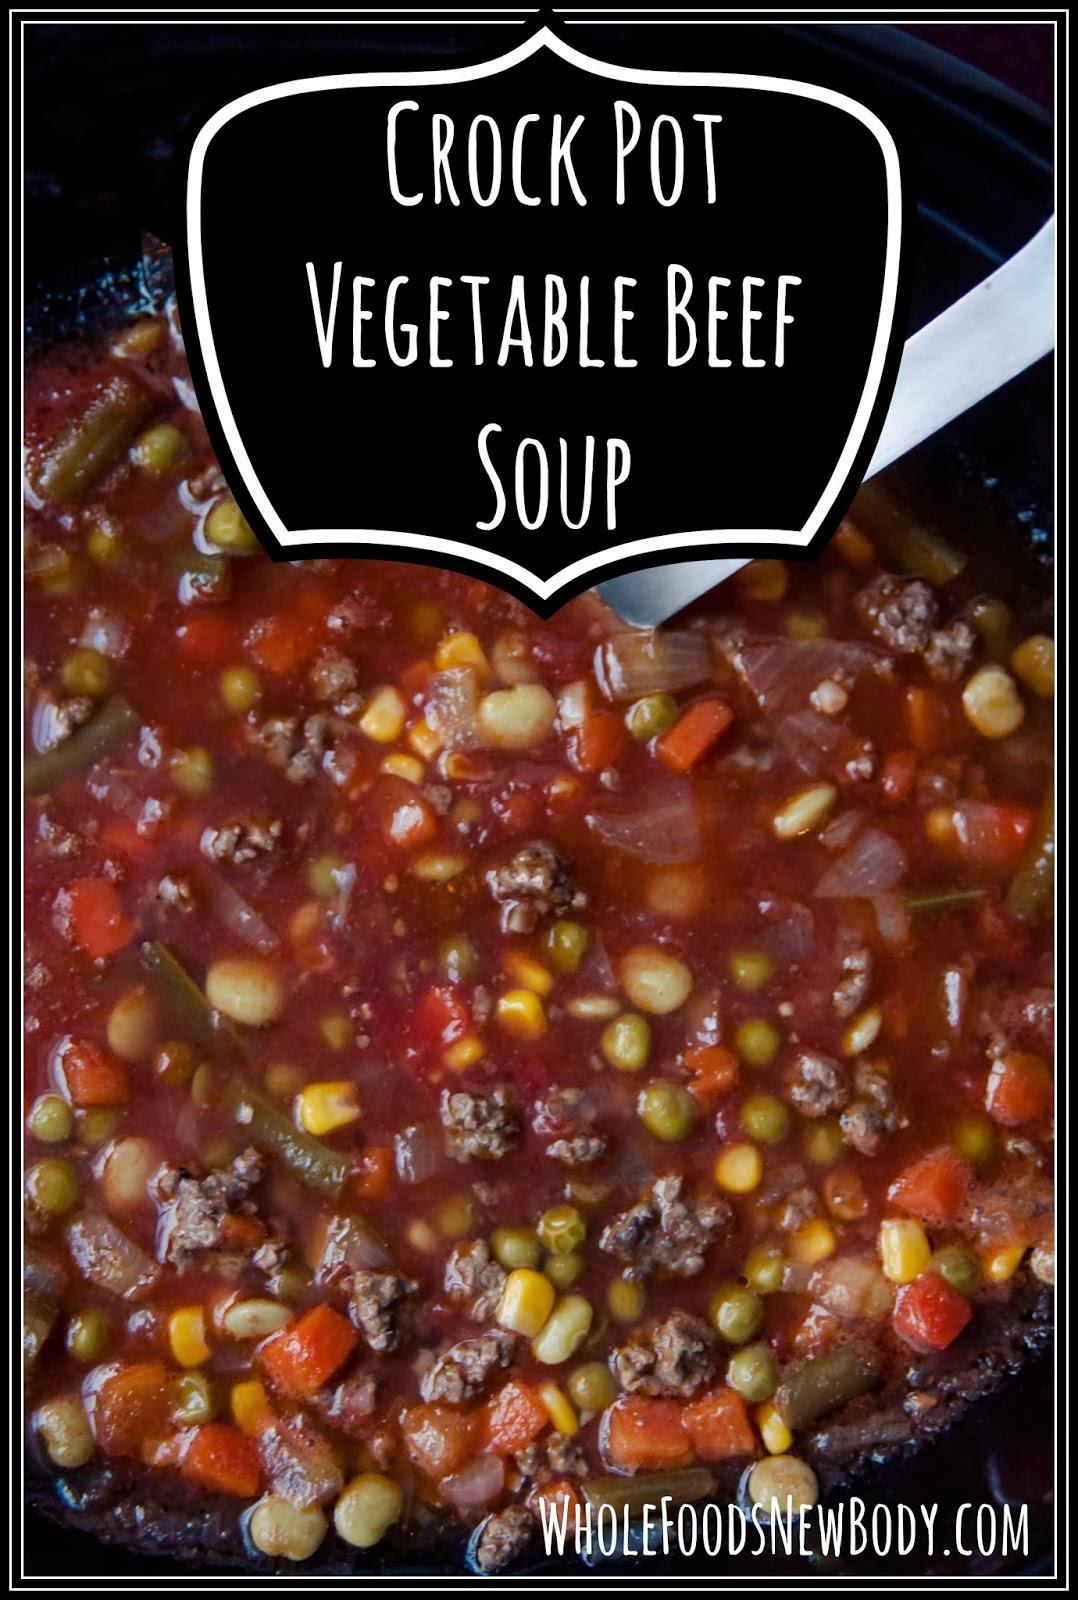 Vegetable Beef Soup Crock Pot  Whole Foods New Body Crock Pot Ve able Beef Soup